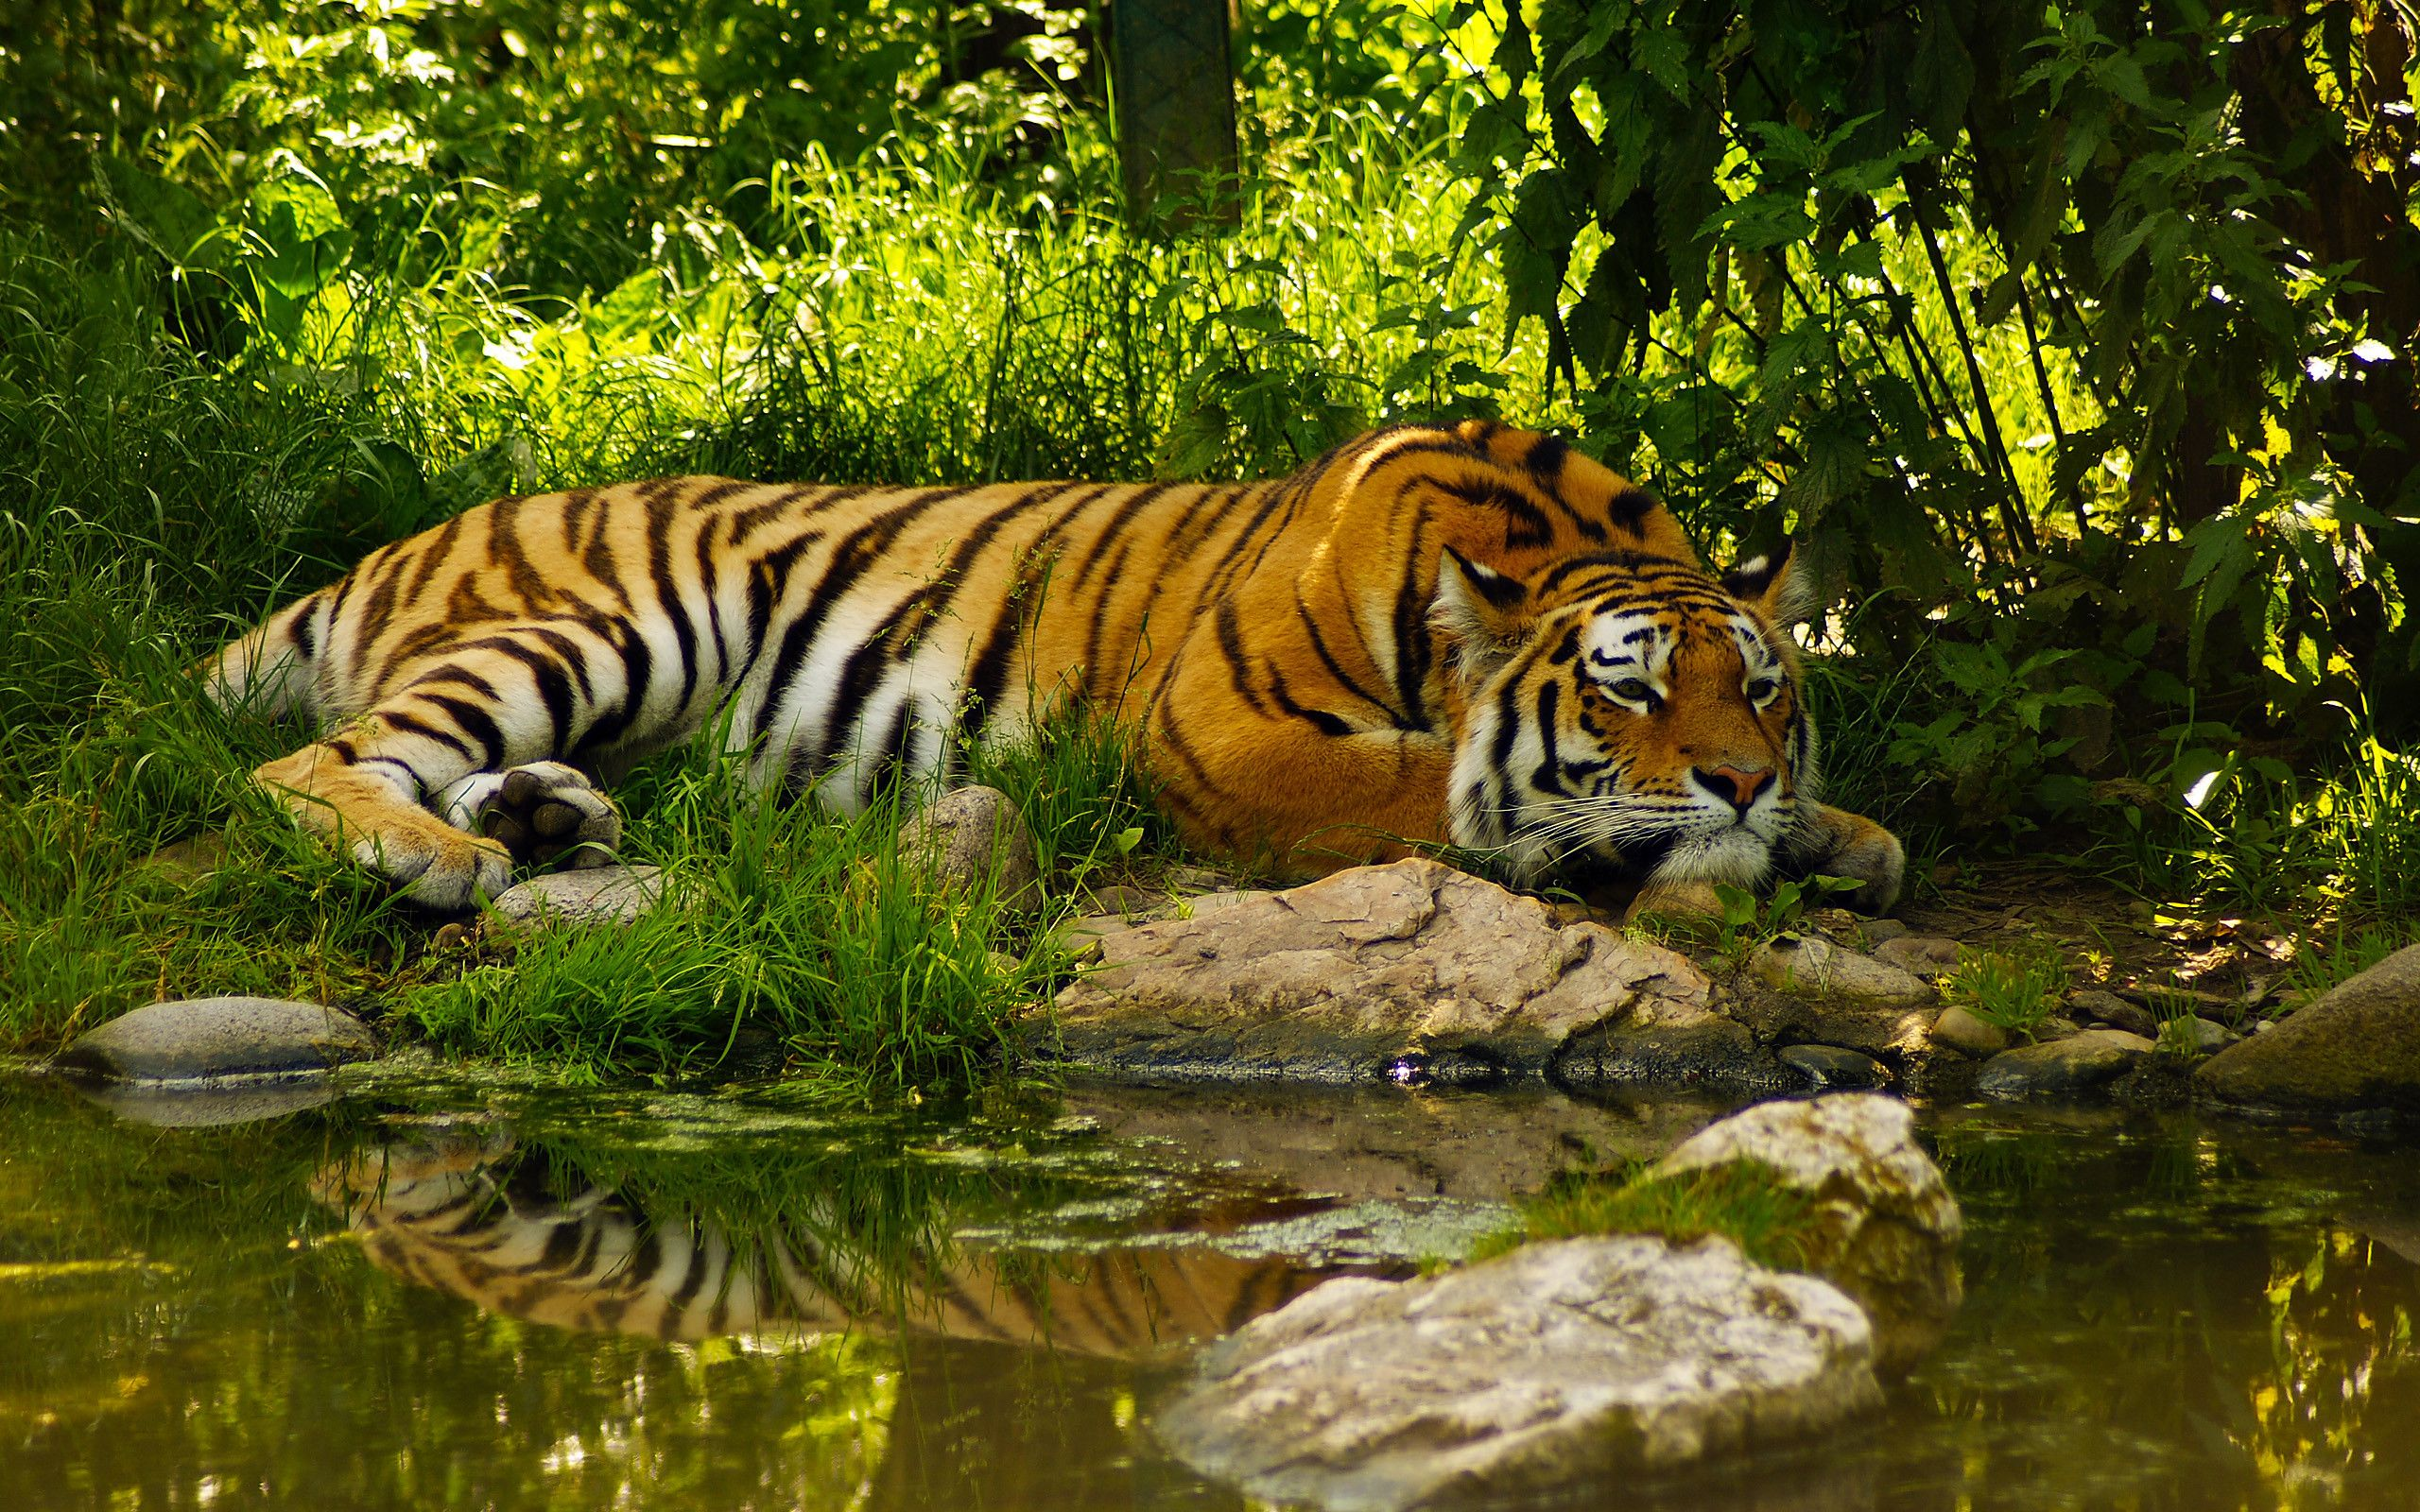 Nature Scenes With Animals | Nature Scenes With Animals 2560x1600 ...